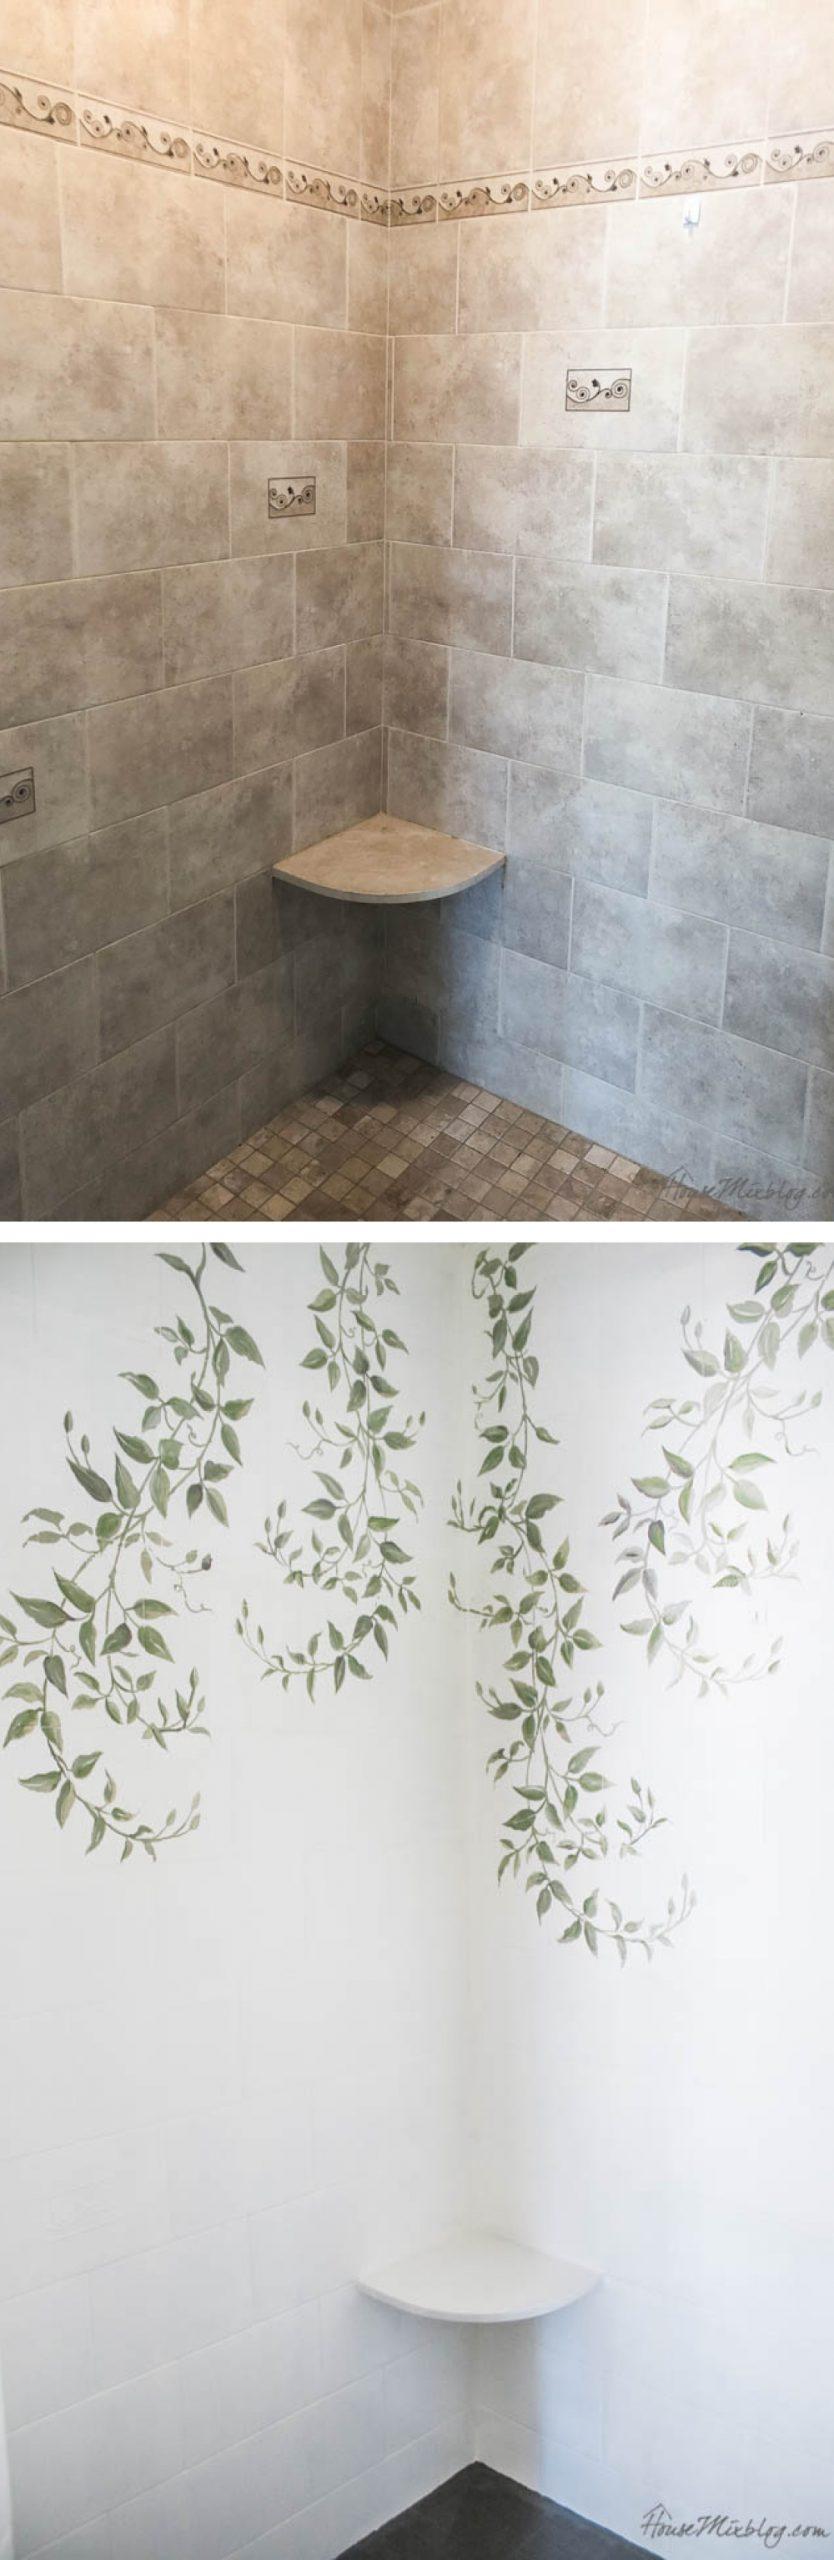 how to paint bathroom tile floor